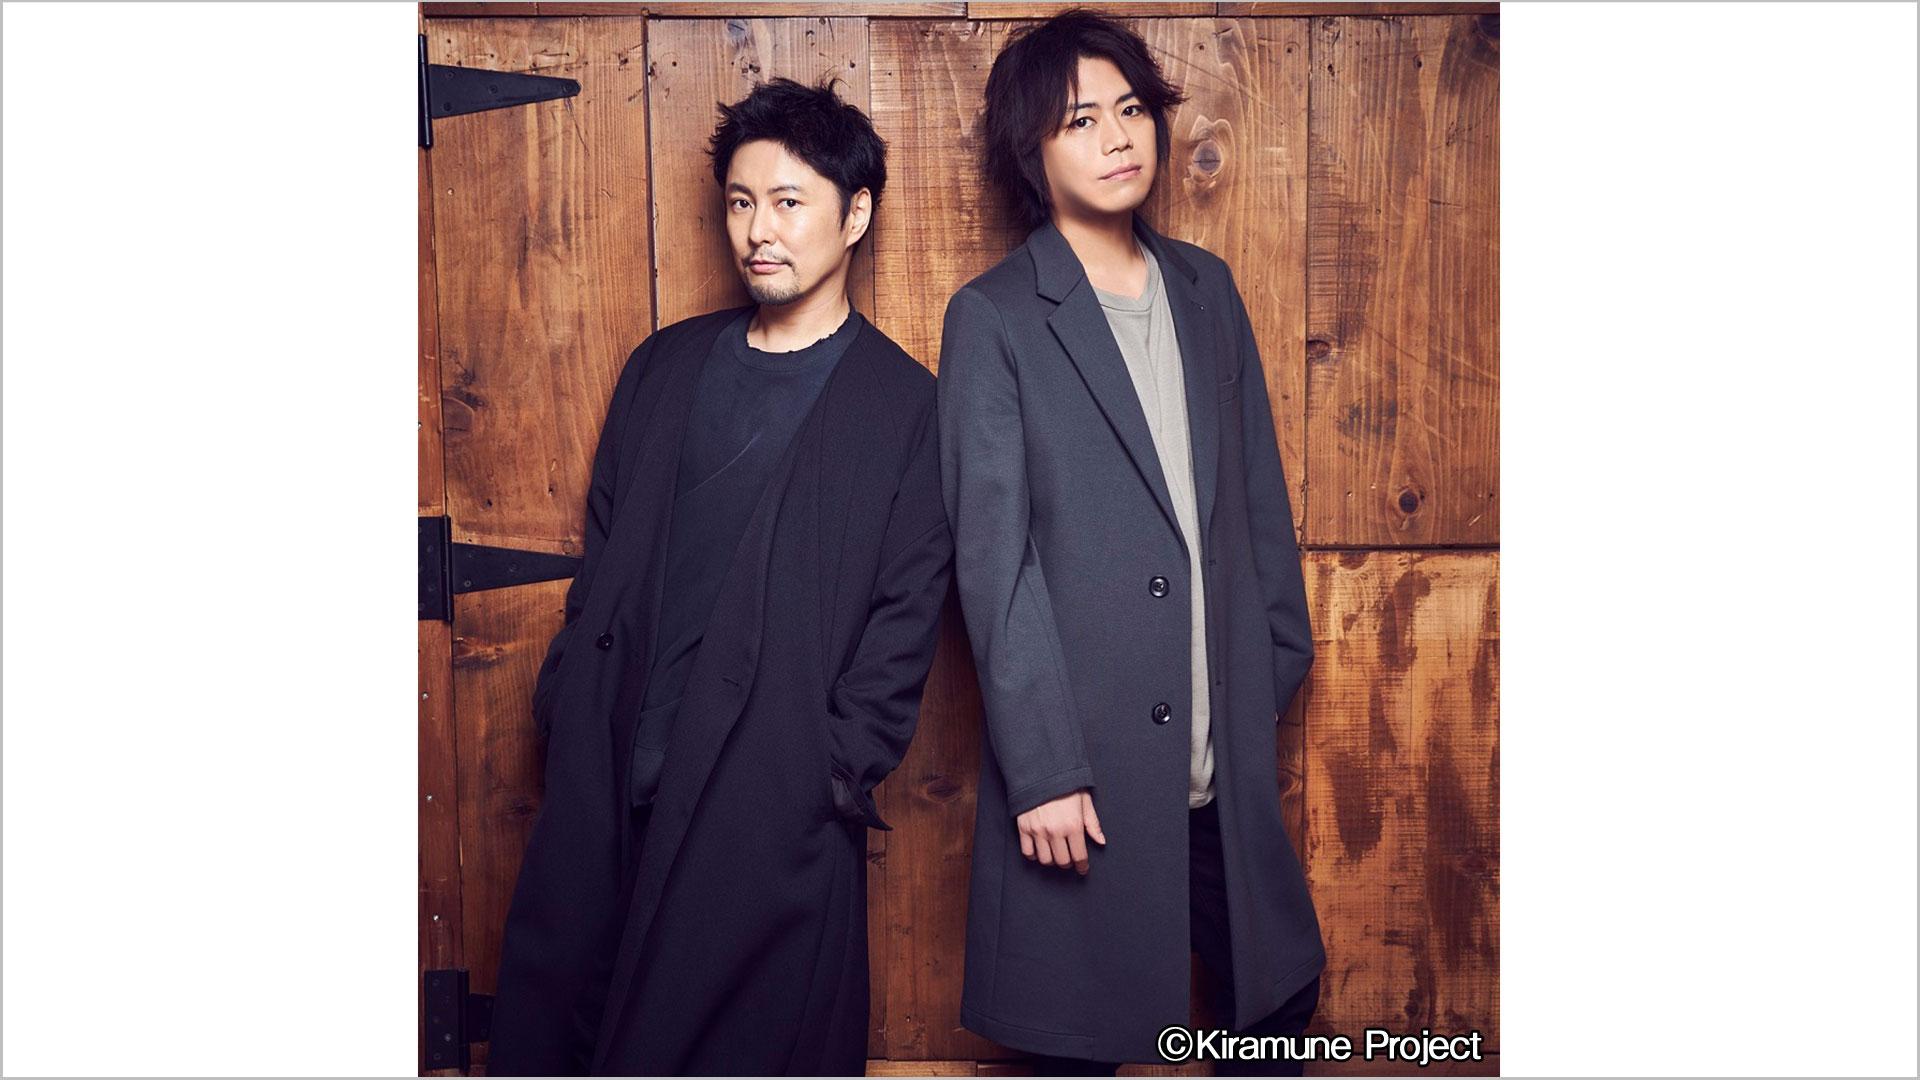 KiramuneカンパニーR #61 ゲスト:天崎滉平